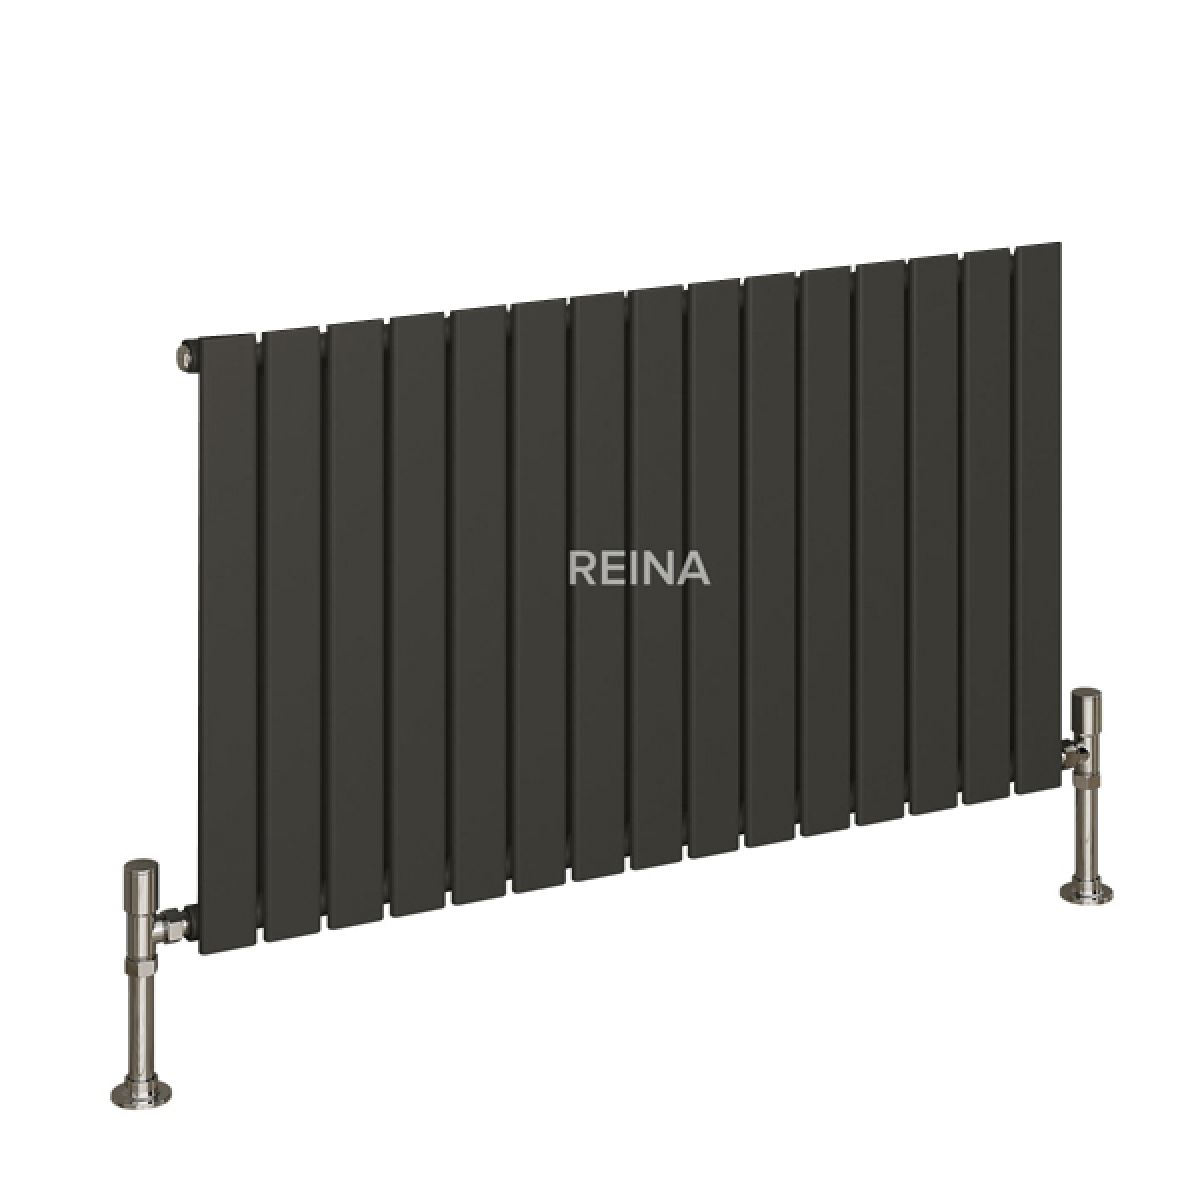 Reina Flat Anthracite Single Panel Aluminium Radiator 600 x 1254mm